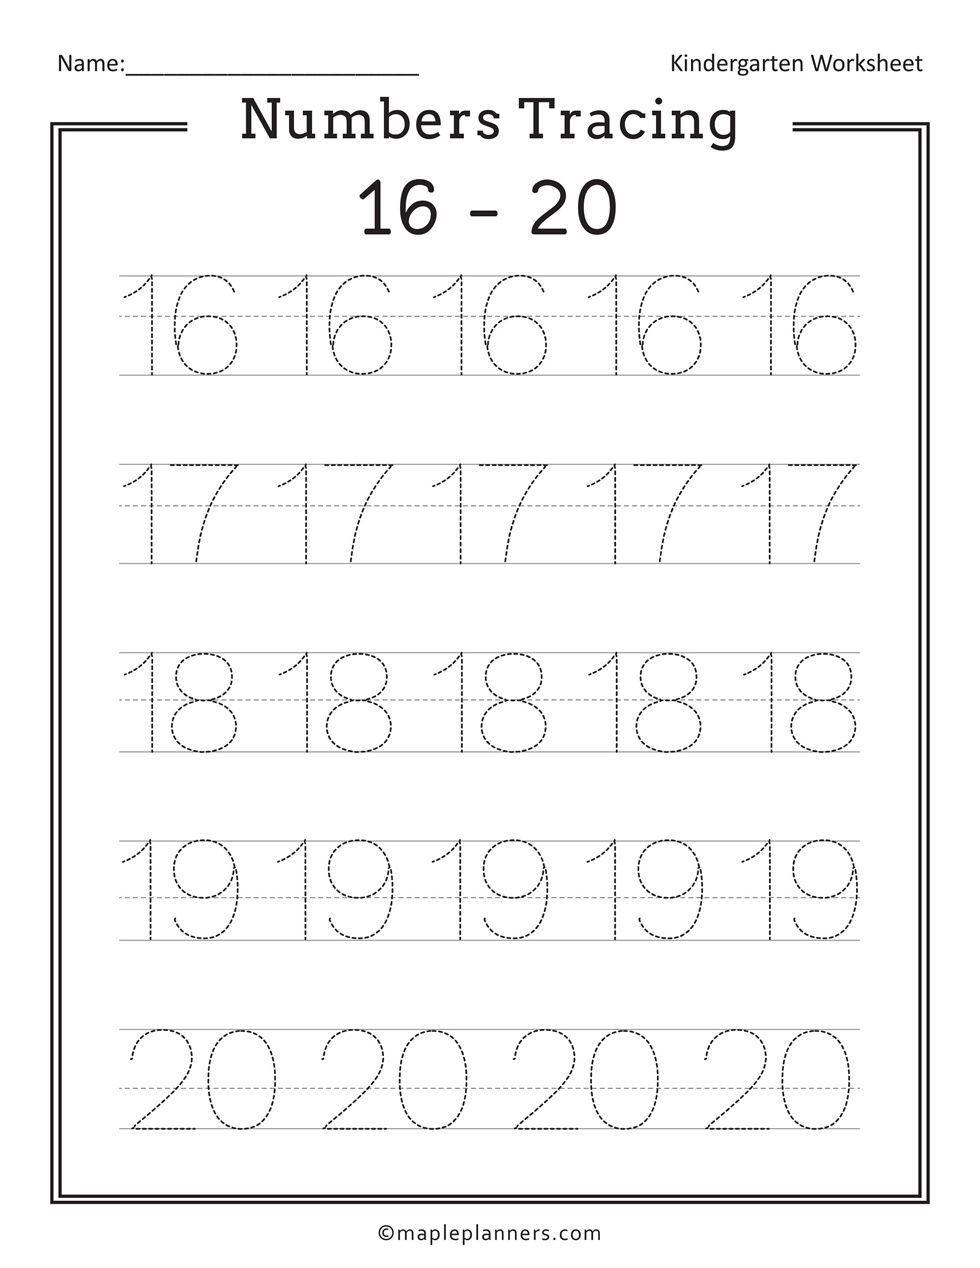 Free Printable Numbers Tracing 1 20 Worksheets For Kids In 2020 Kindergarten Math Worksheets Free Tracing Worksheets Free Free Printable Numbers